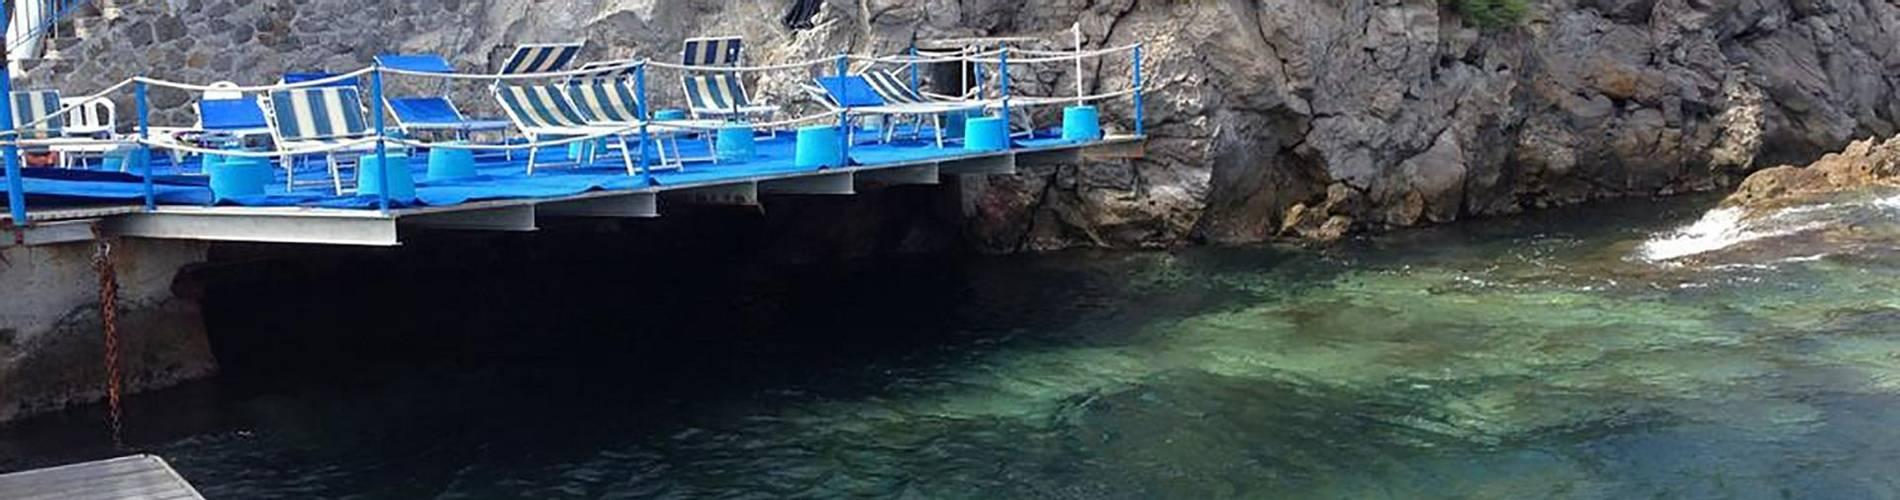 Rocce Azzurre, Sicily, Italy (3).jpg